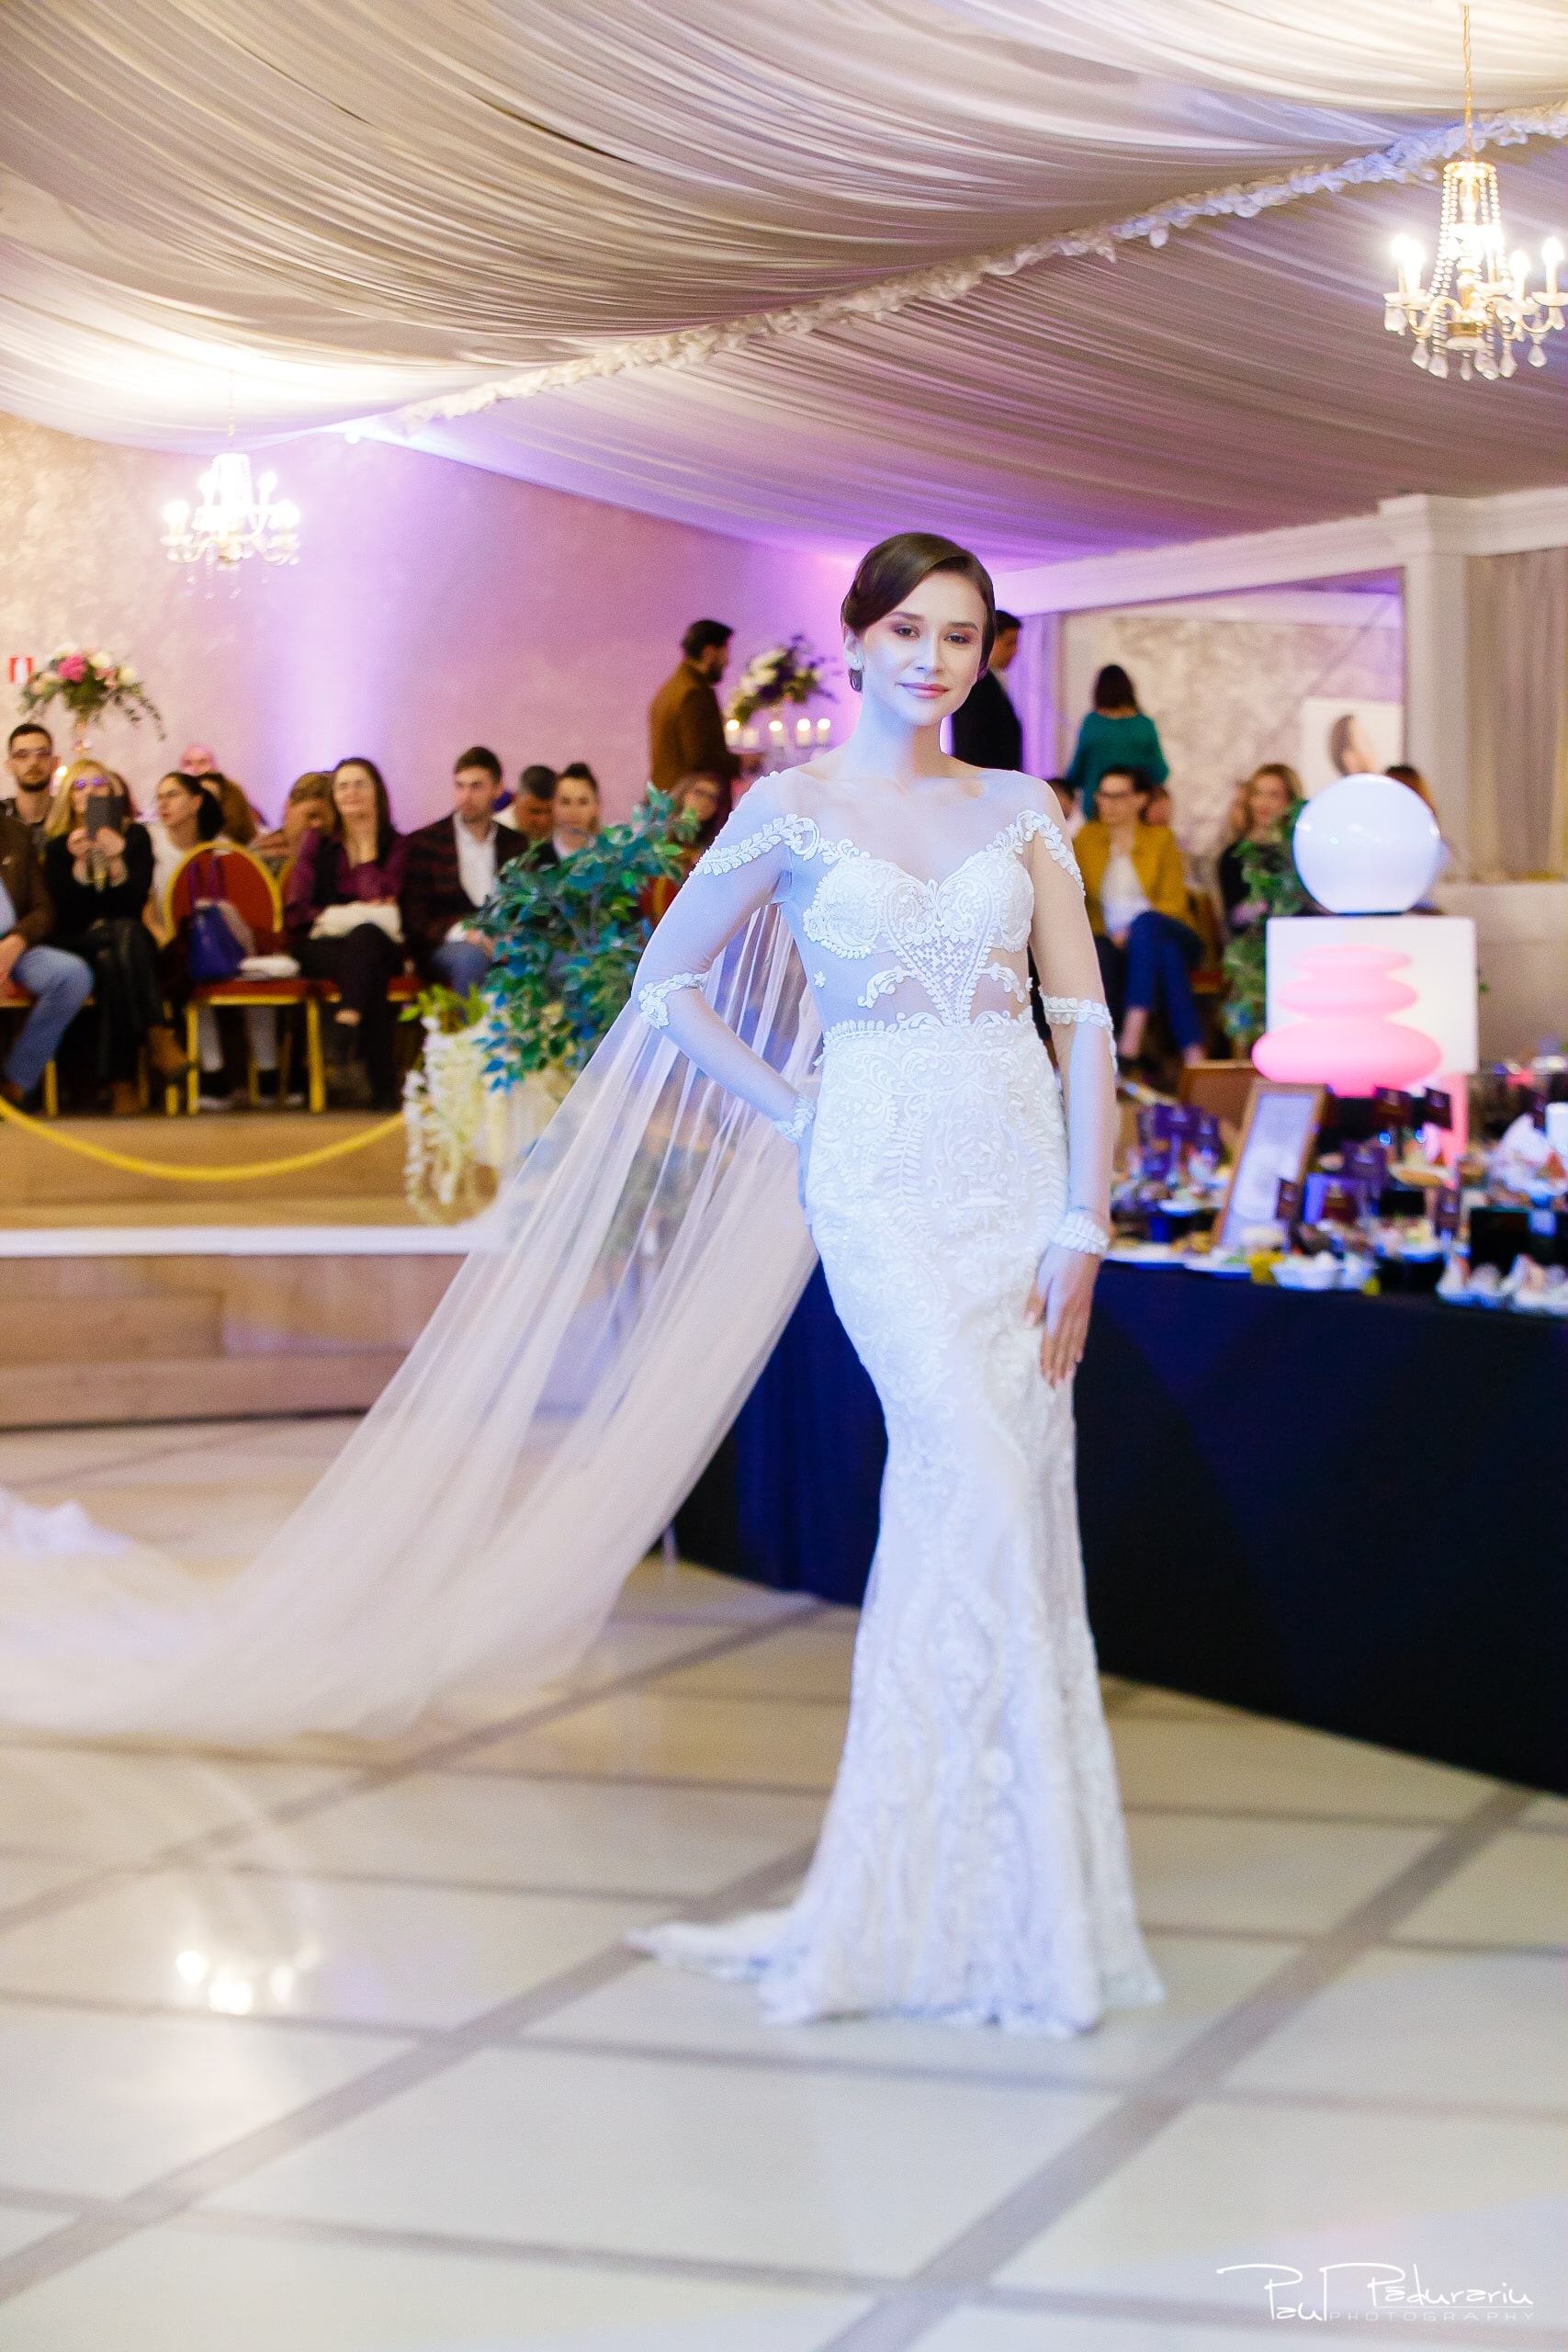 Modern Bride Edith Val colectie rochie mireasa 2019 - fotograf profesionist iasi paul padurariu | nunta iasi 9